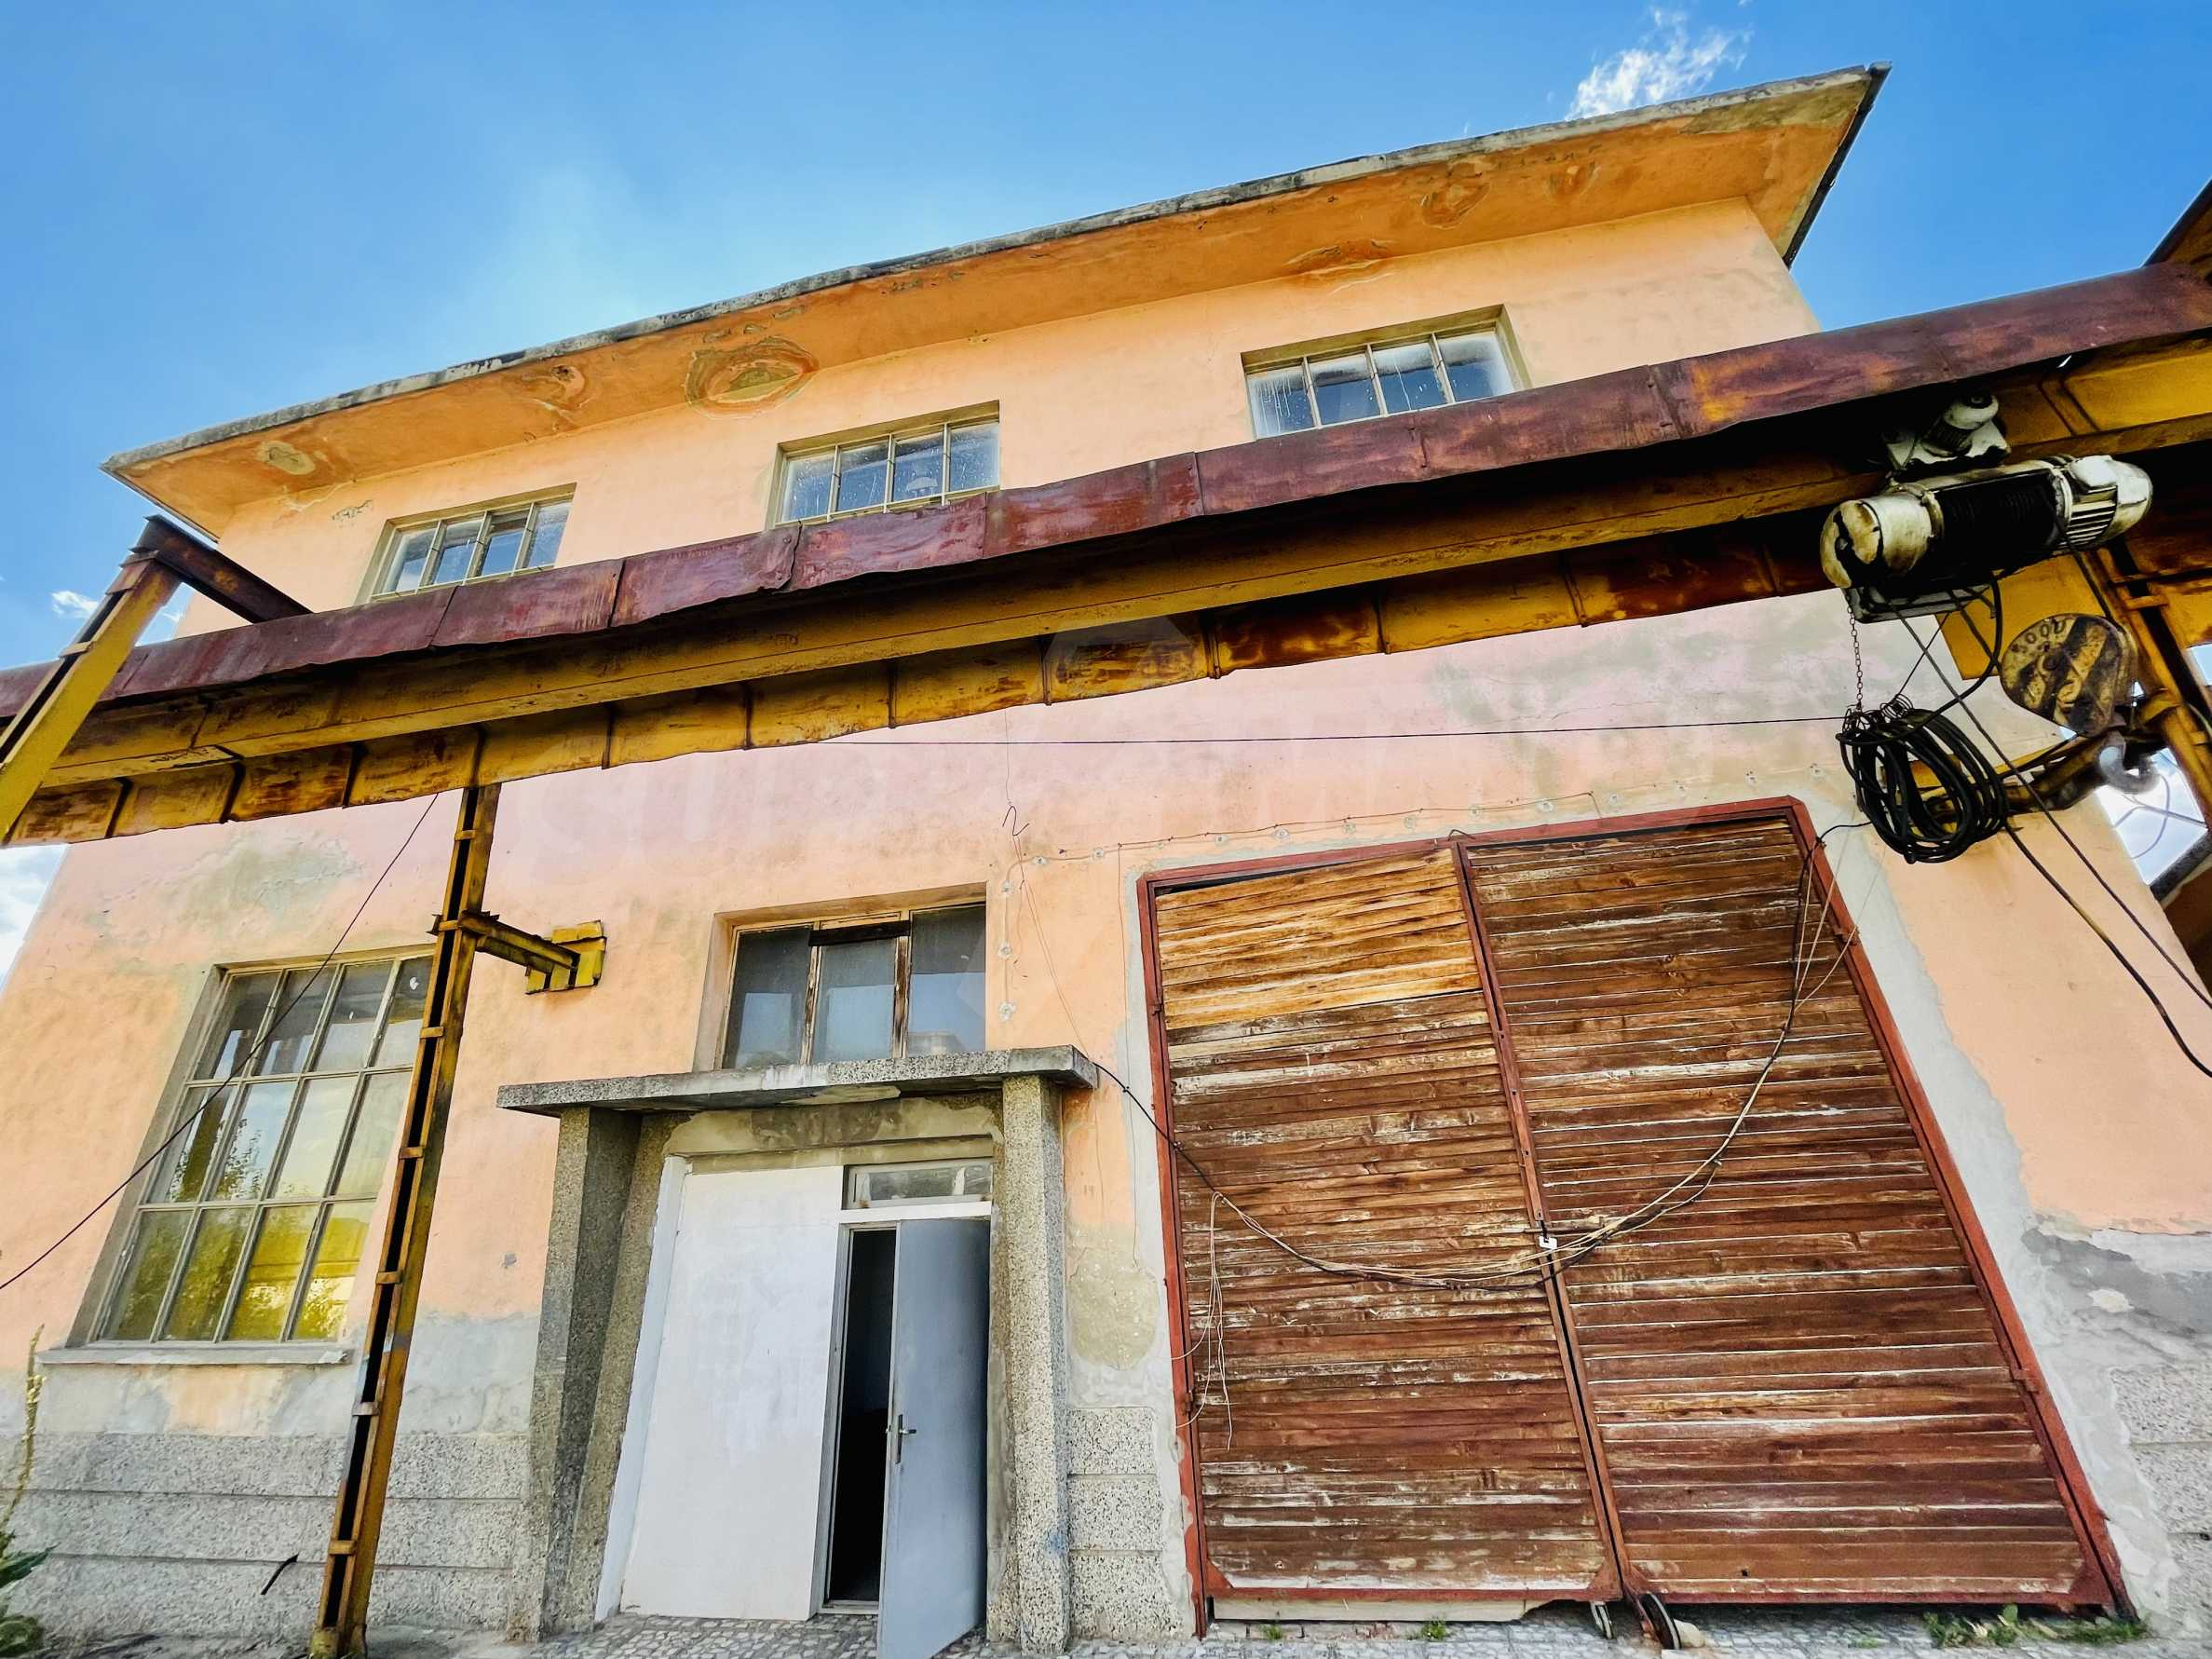 Fabrik in der Nähe von Veliko Tarnovo 6